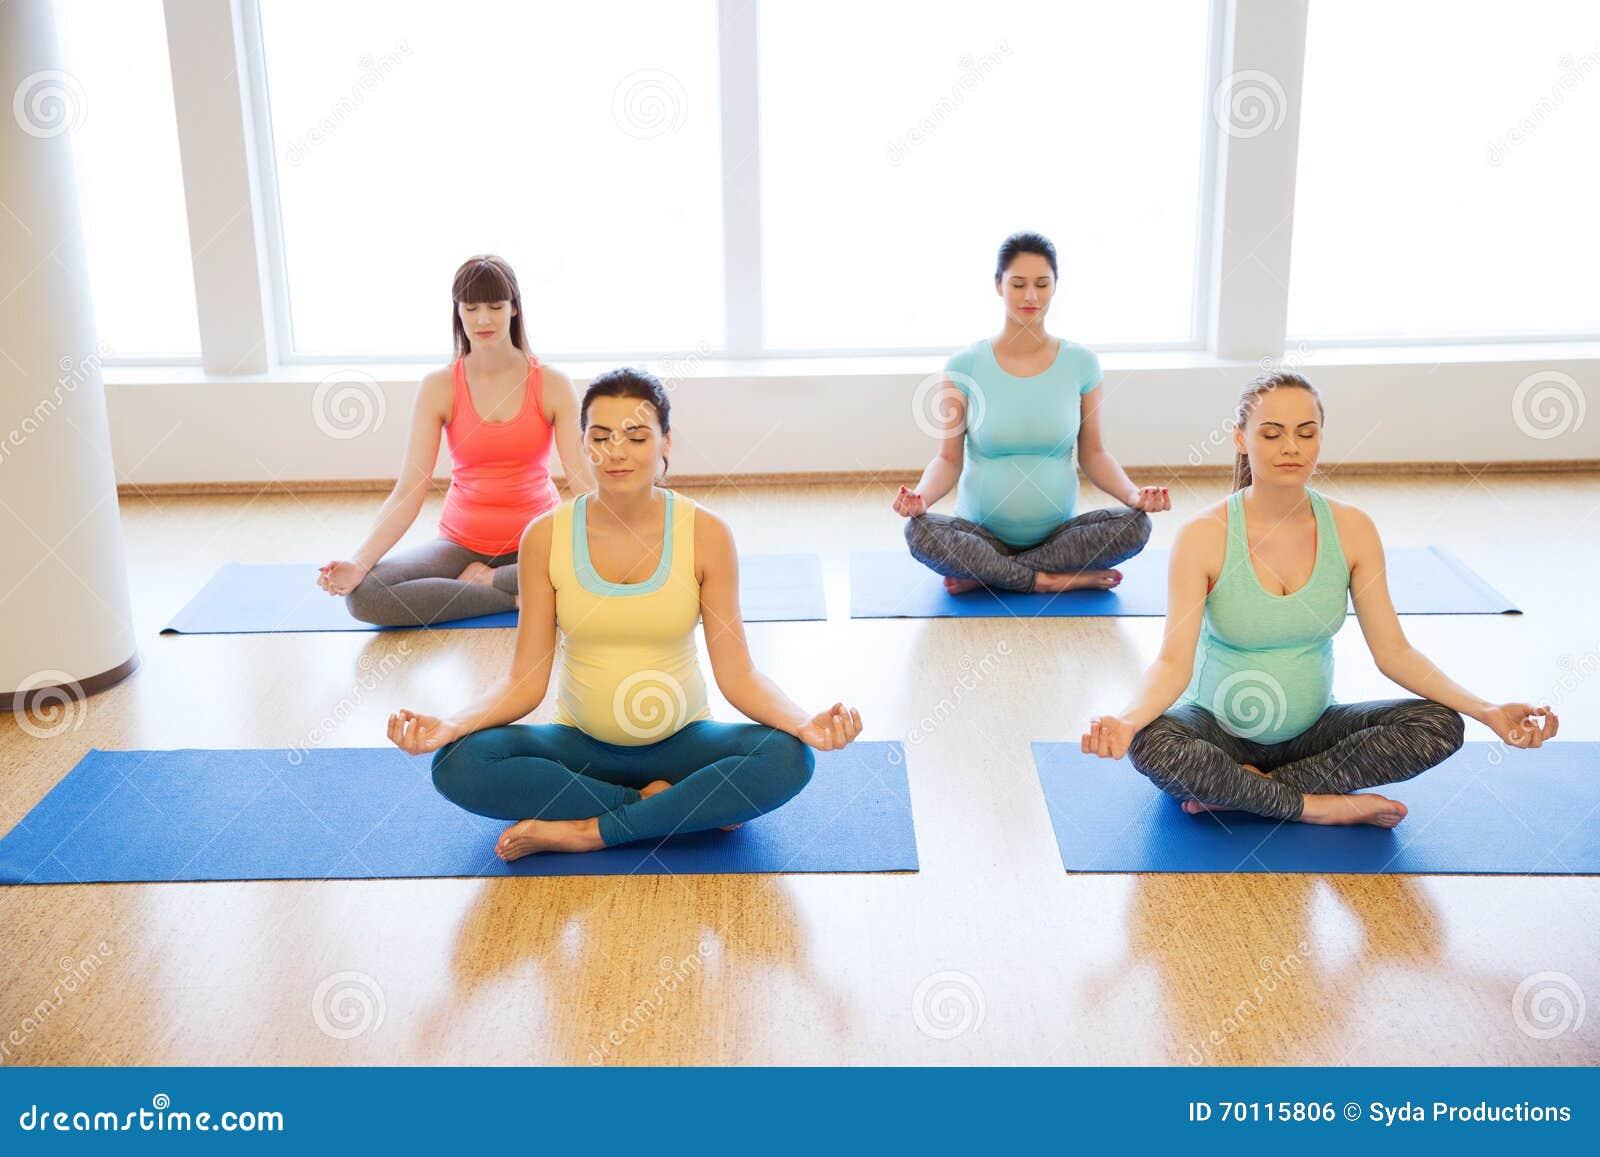 Happy Pregnant Women Exercising Yoga In Gym Stock Photo ...